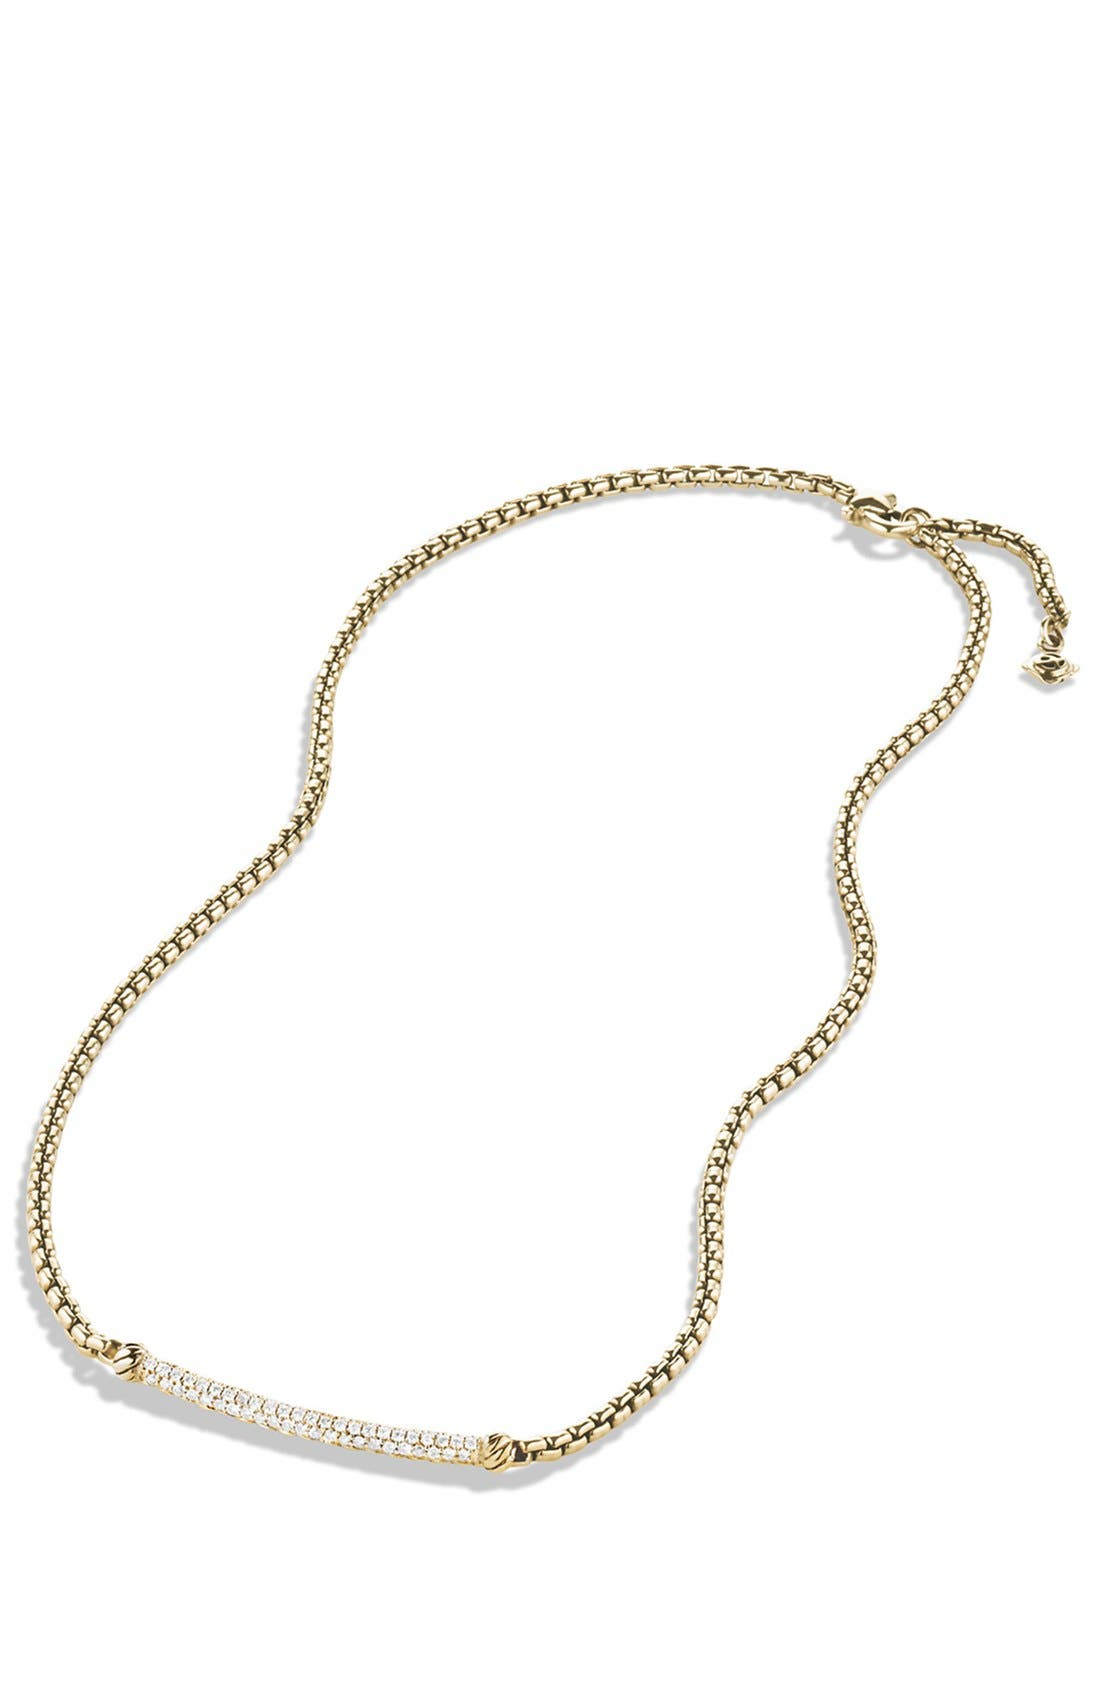 Alternate Image 2  - David Yurman 'Petite Pavé' Metro Chain Necklace with Diamonds in Gold